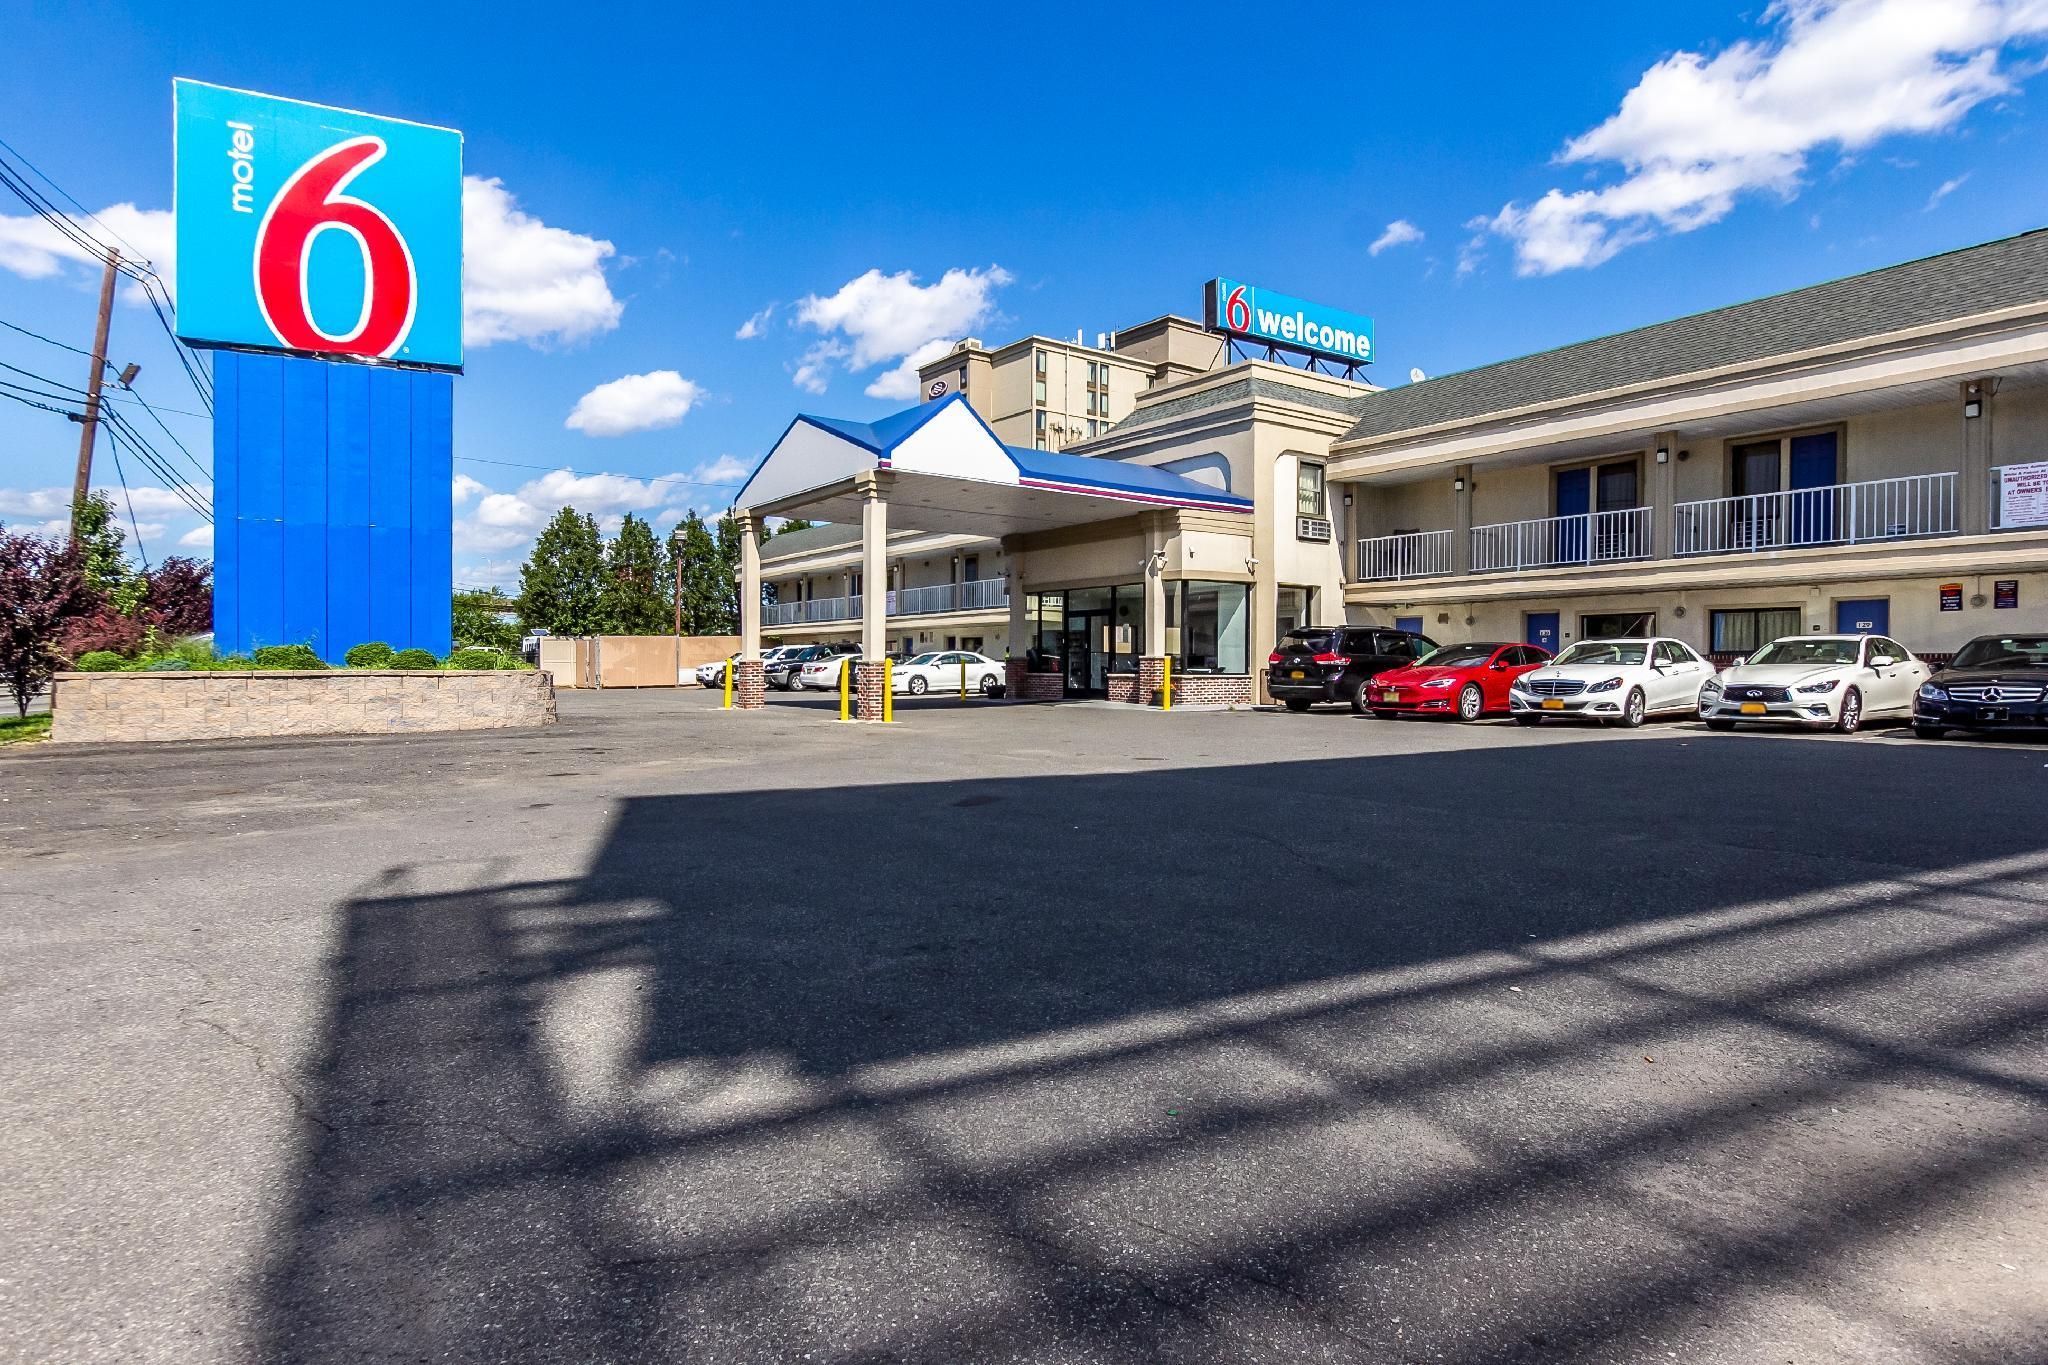 Motel 6 Elizabeth - Newark Liberty International Airport, Union